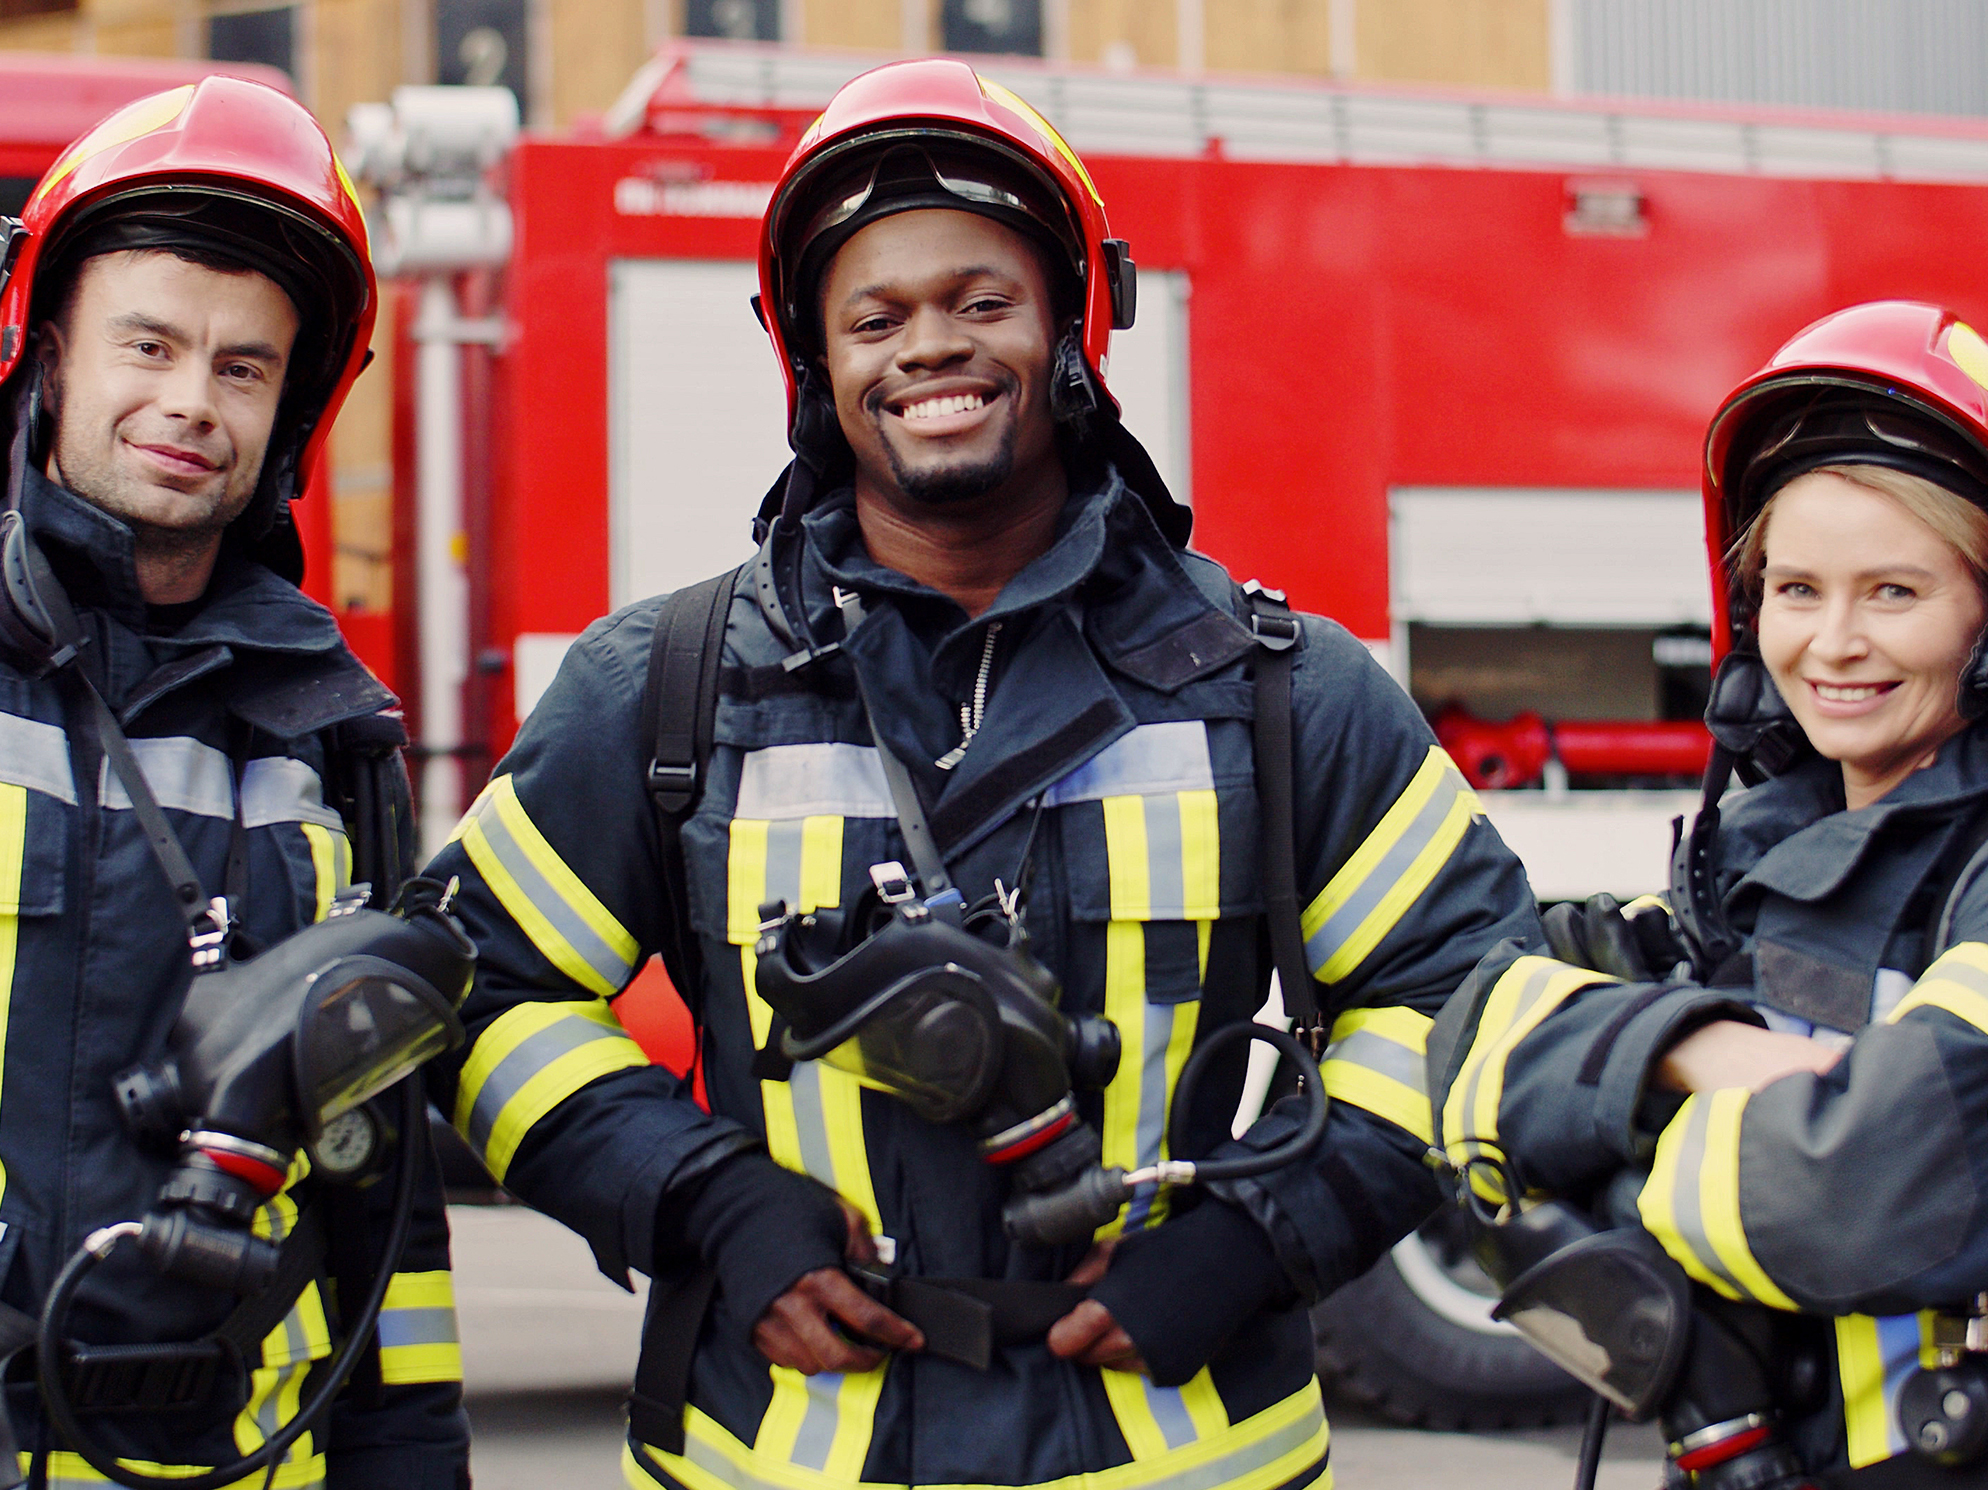 CWS Healthcare Feuerwehr